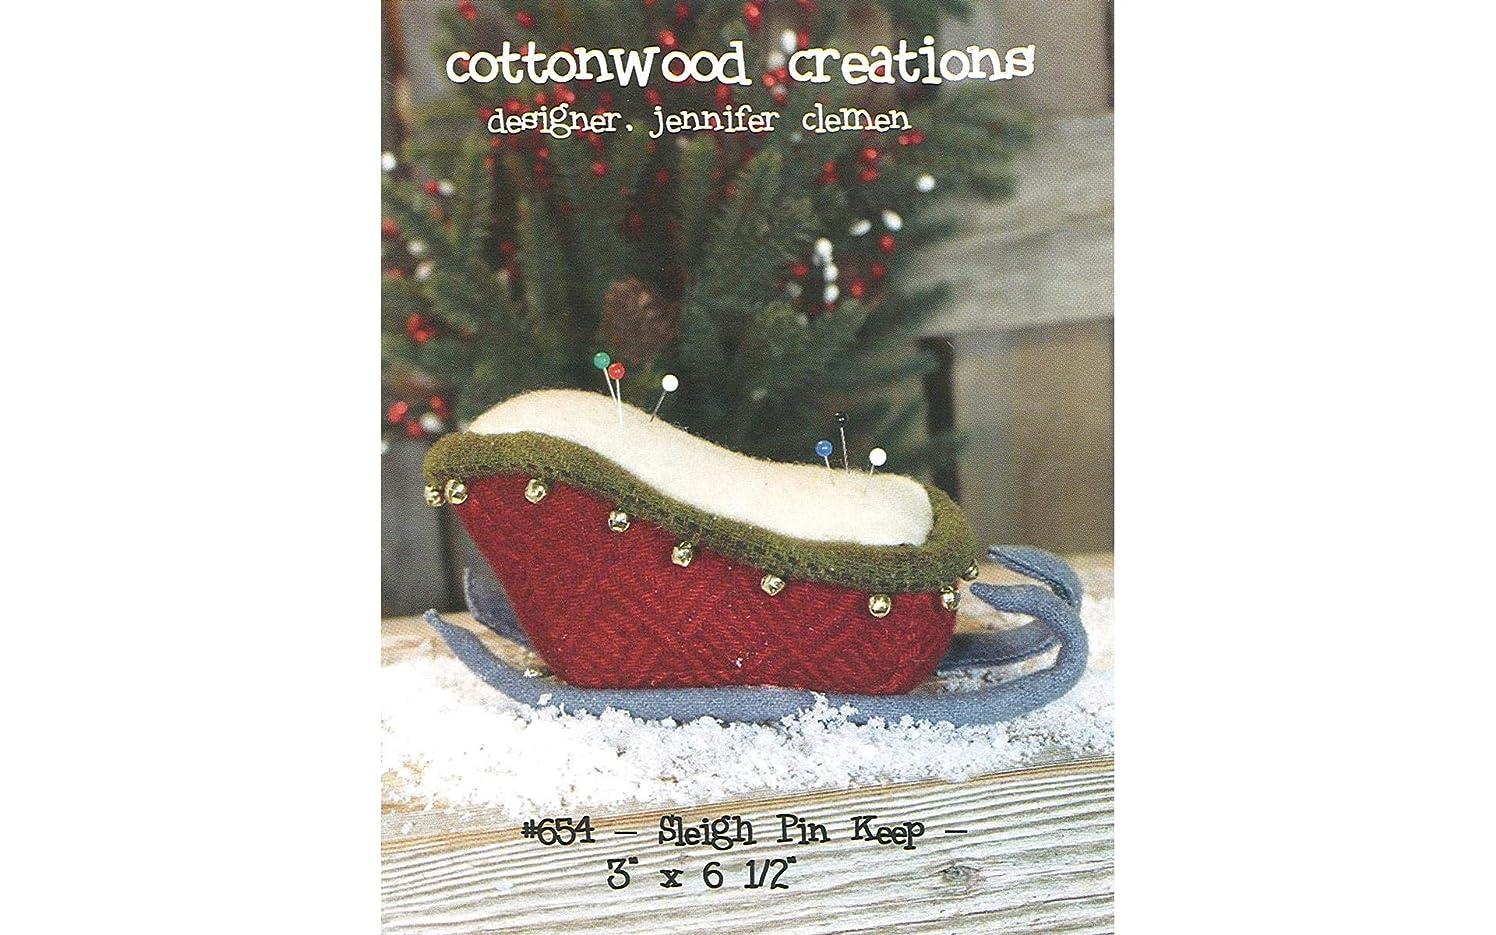 Cottonwood Creations CWC654 Sleigh Pin Keep Pattern